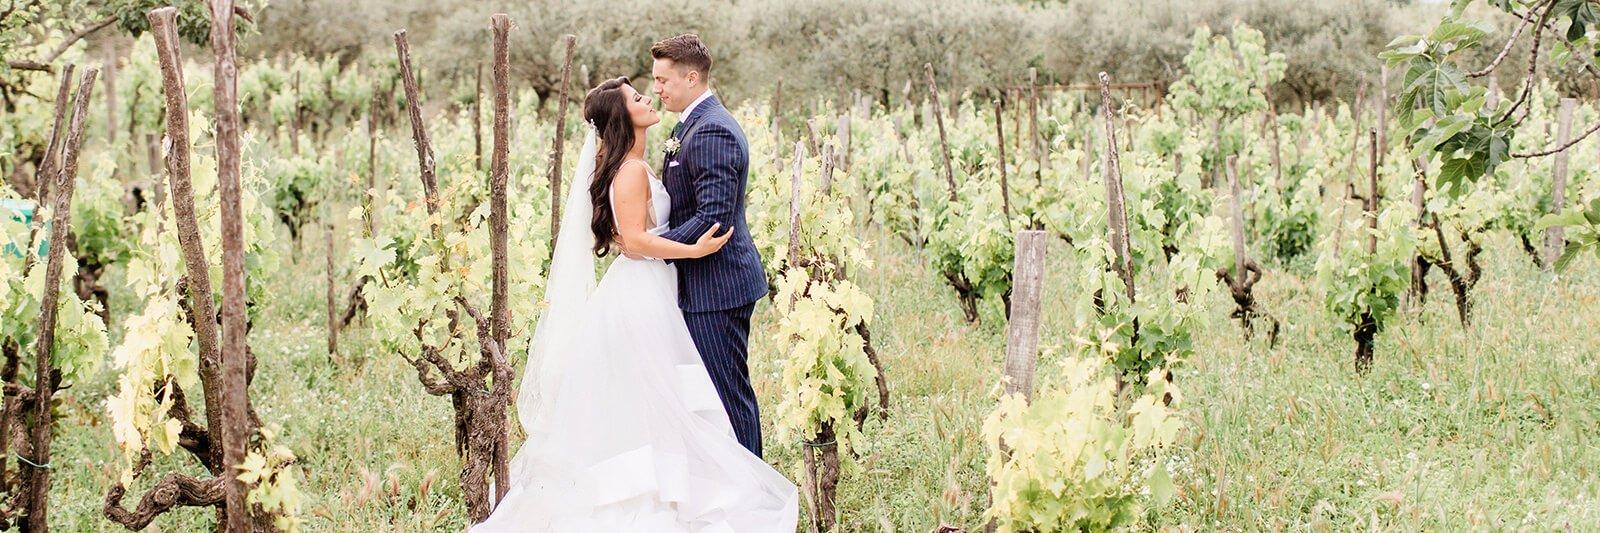 Sicily Vineyard Wedding Cover